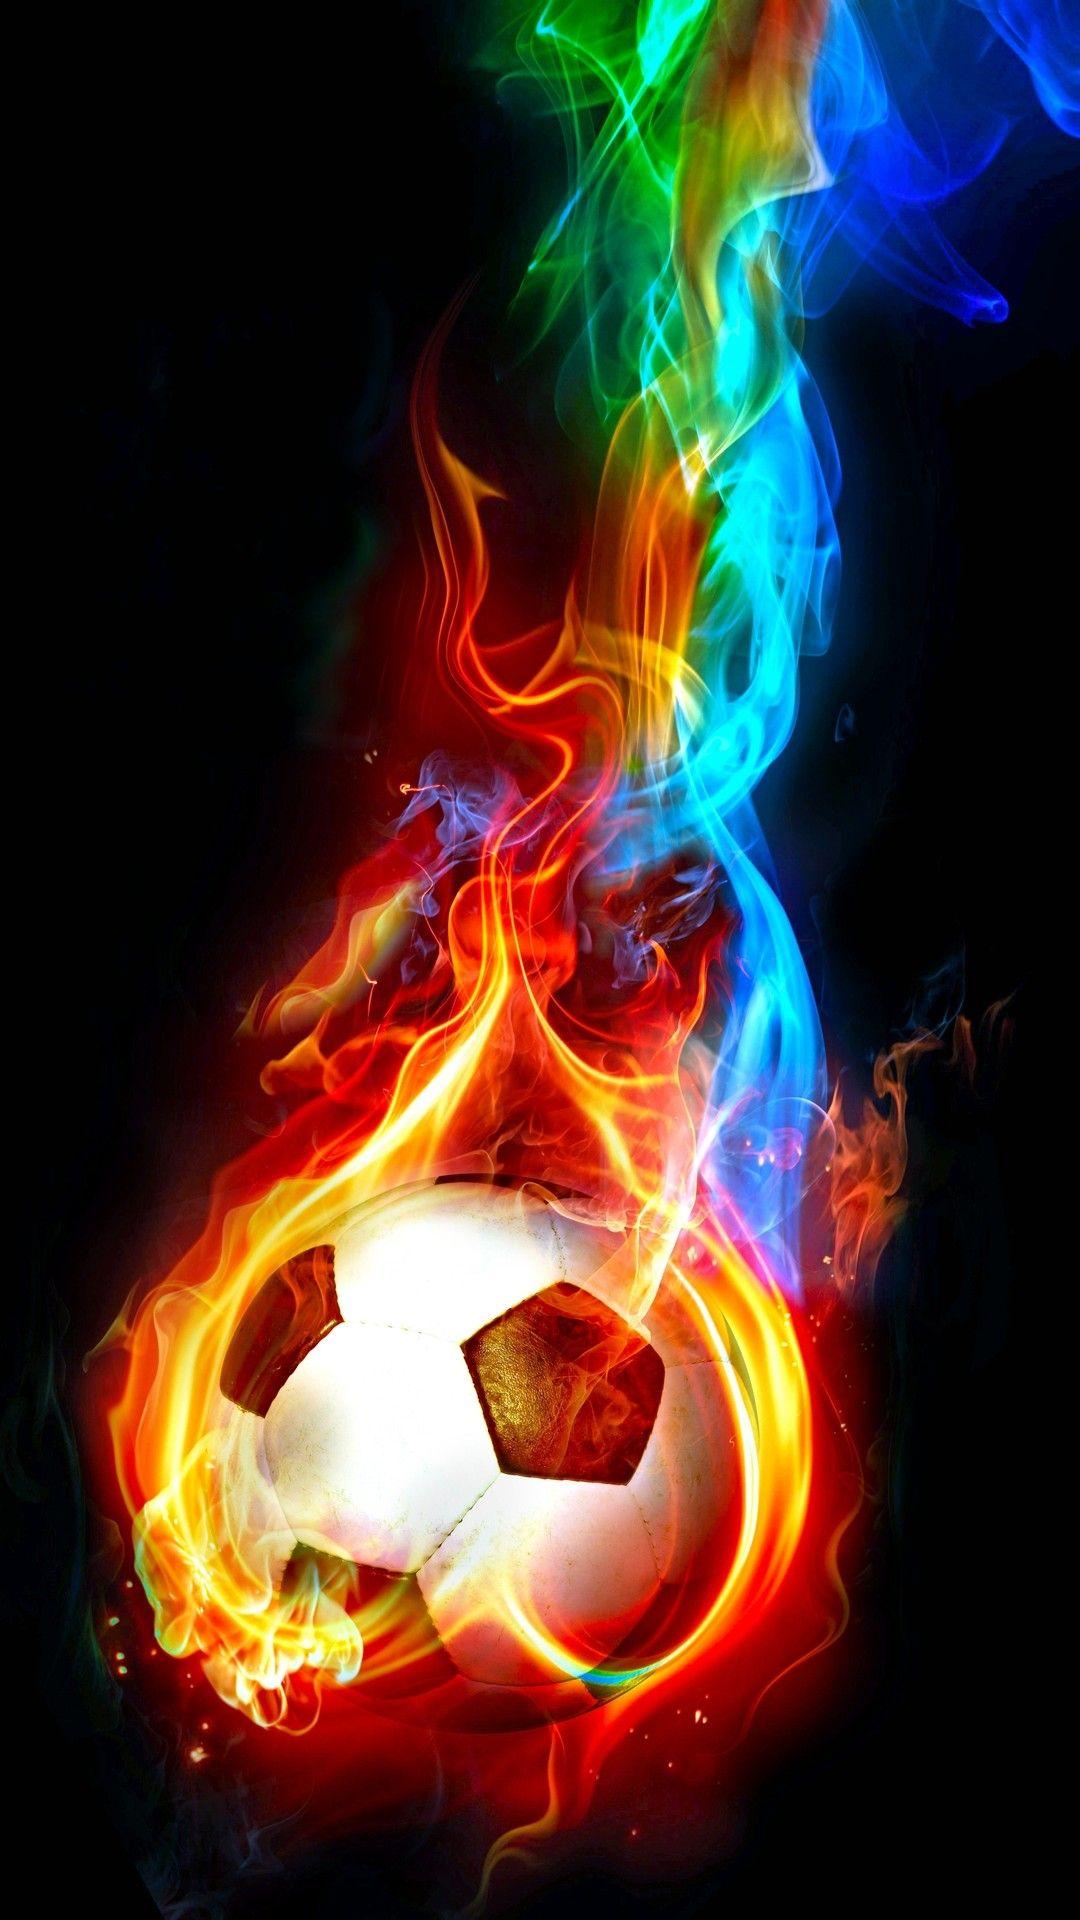 Soccer Wallpaper Android Soccer Ball Football Wallpaper Soccer Art